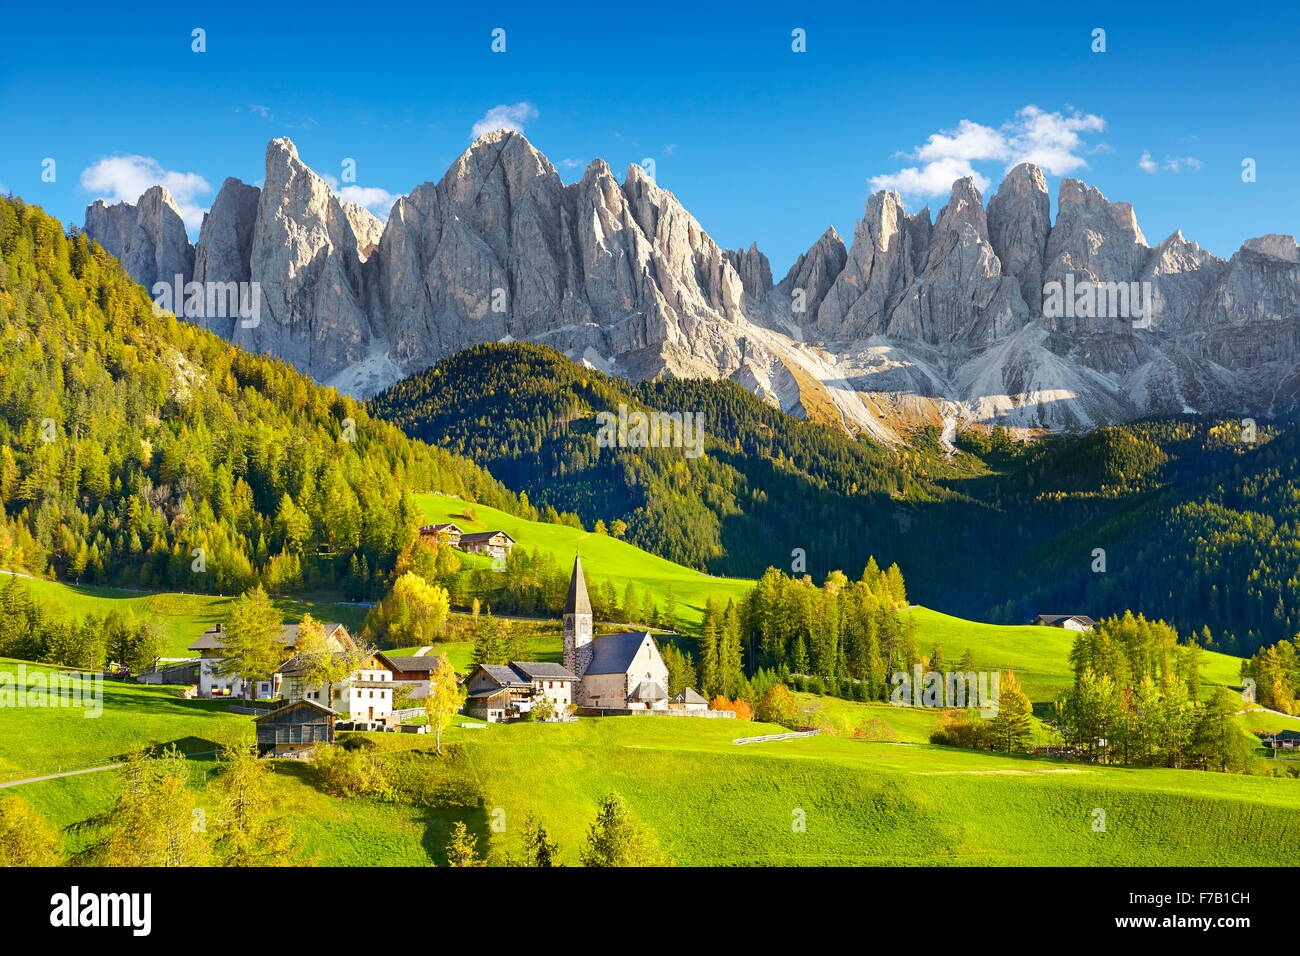 Puez Odle Nature Park, Dolomites Mountains, European Alps, South Tyrol, Italy - Stock Image